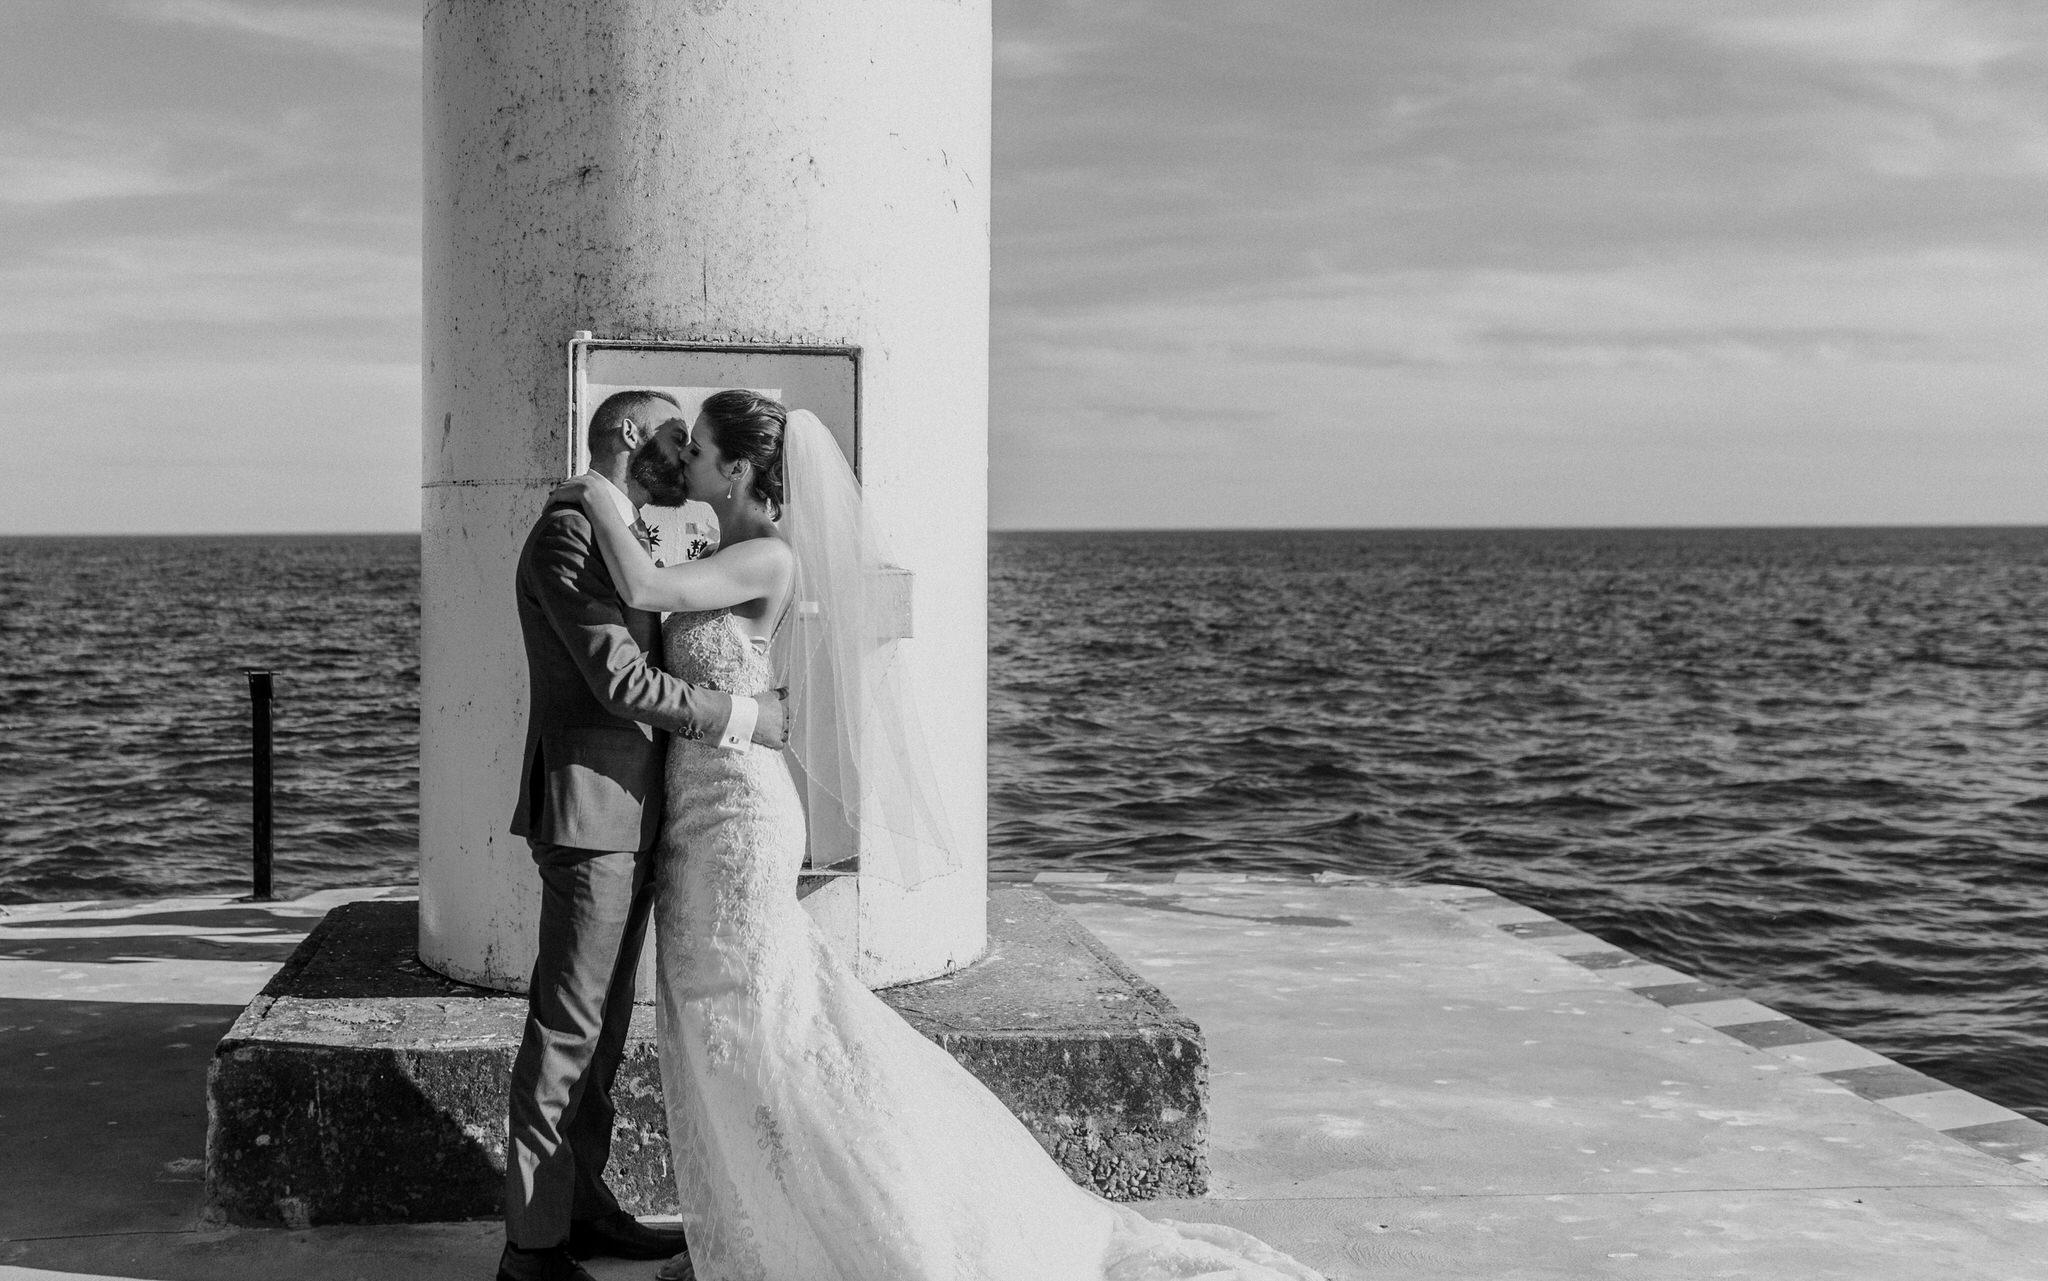 Brock Street Brewery Wedding - bride and groom kiss on the pier